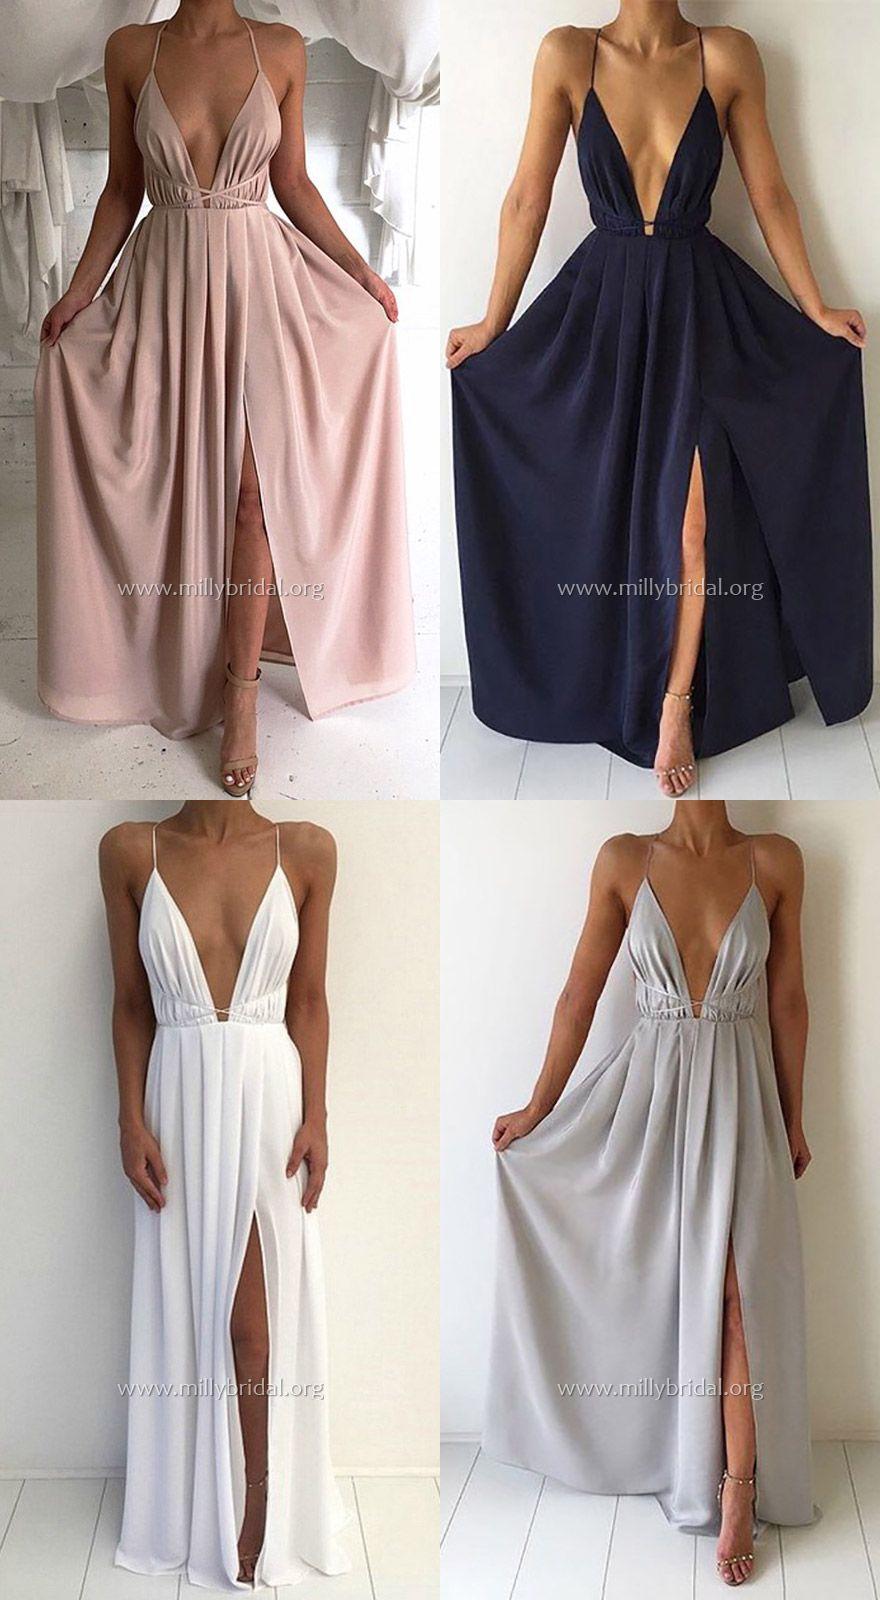 bd1d2a0c161 Prom Dresses 2018